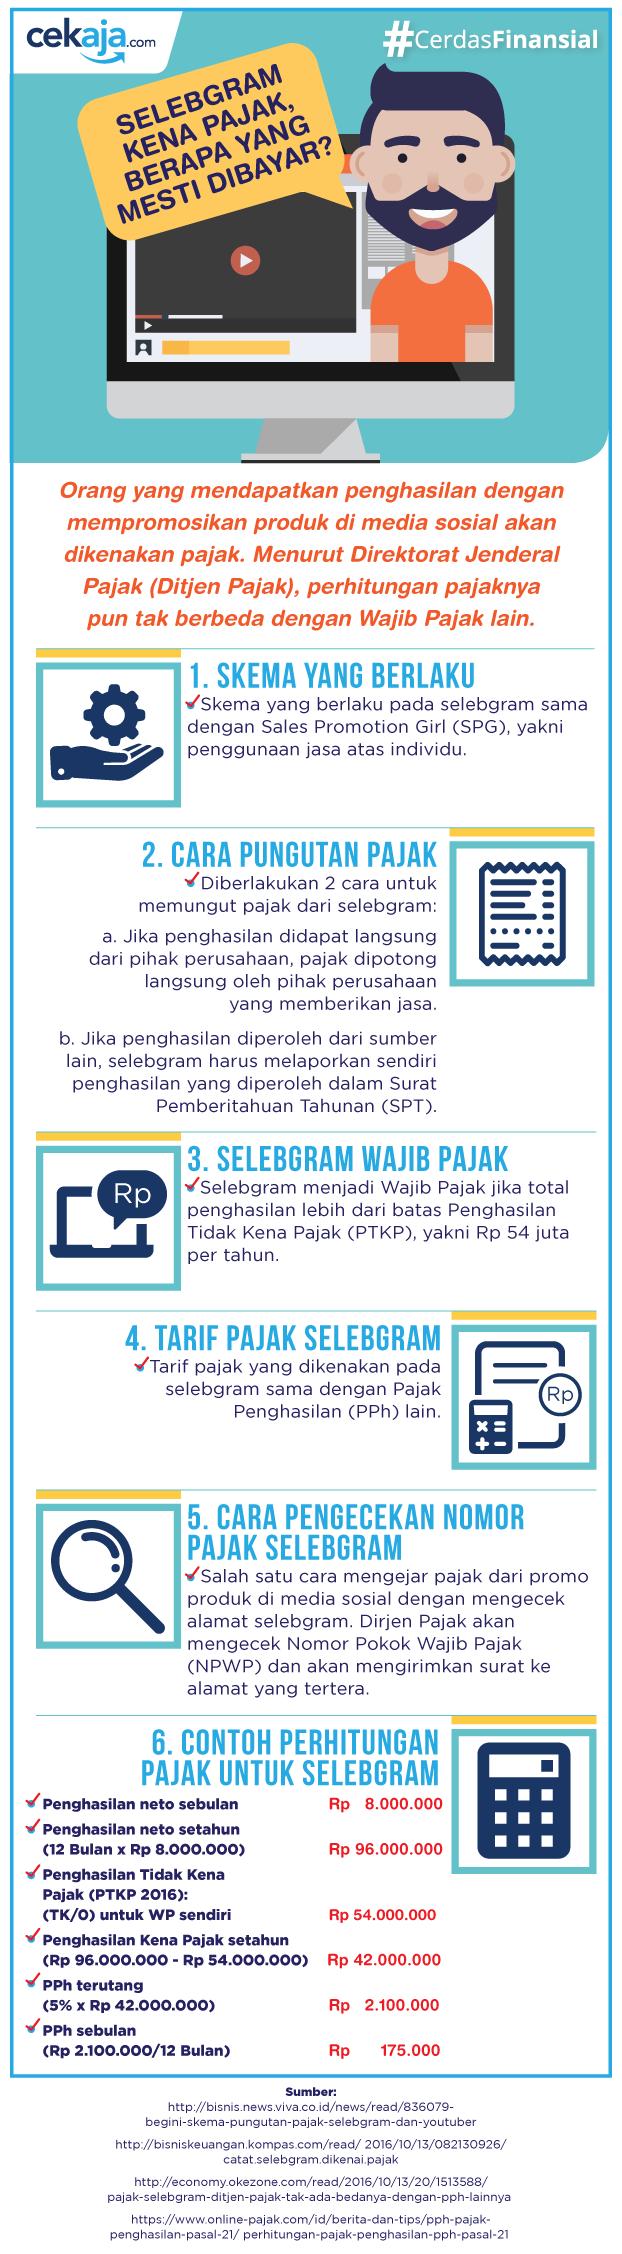 infografis-pajak selebgram - CekAja.com